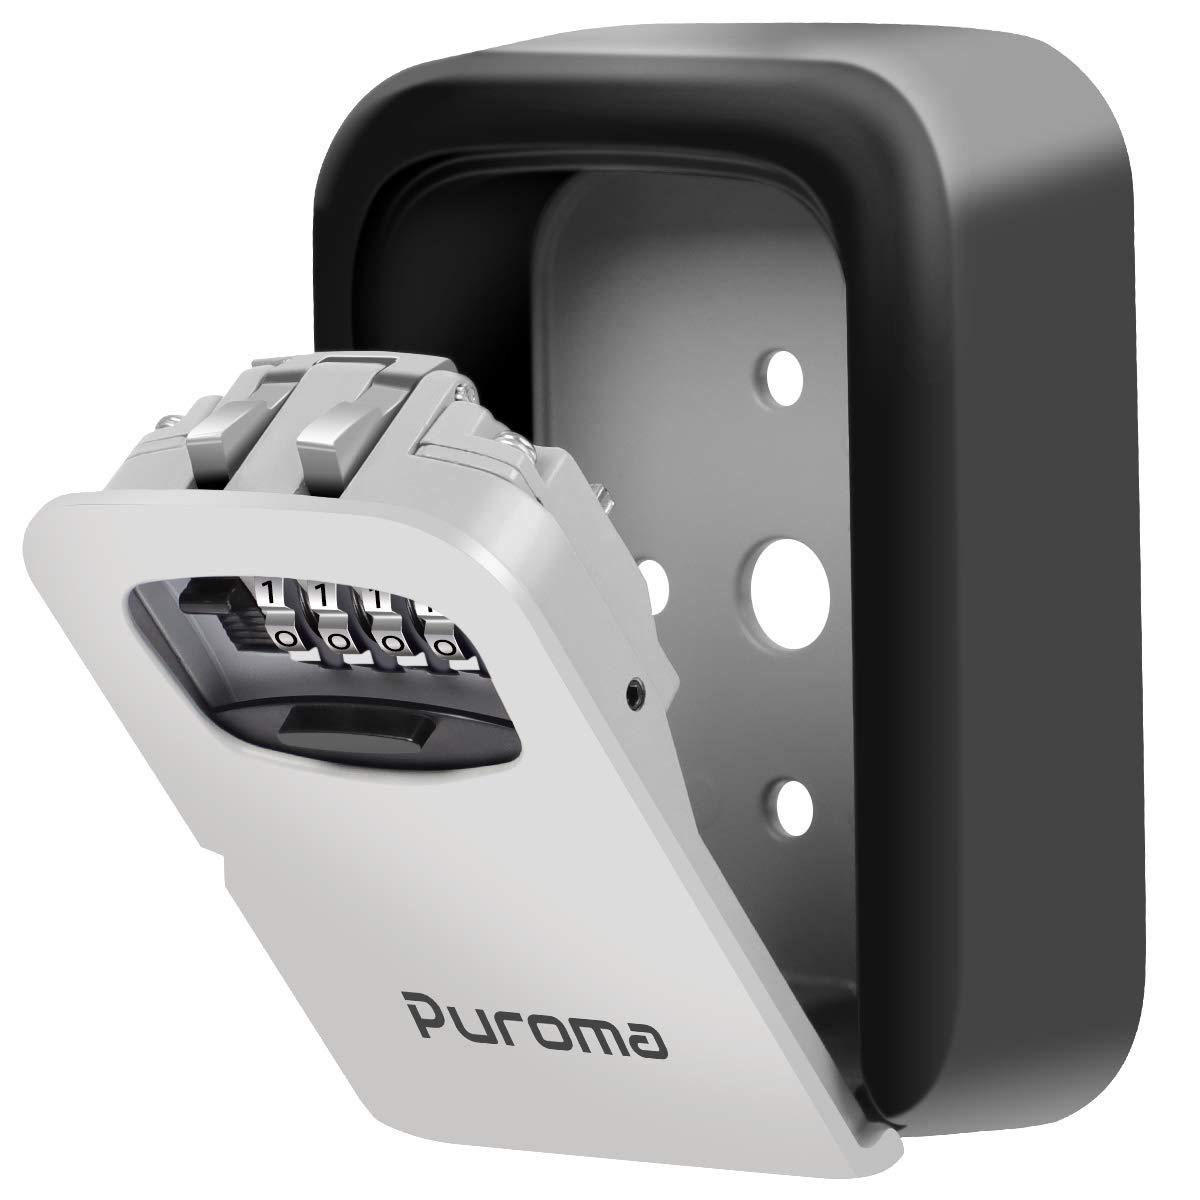 Puroma Key Lock Box, 4-Digit Combination Wall Mount Storage Lockbox 5 Key Large Capacity for House Key, Special Car Key, ID Card by Puroma